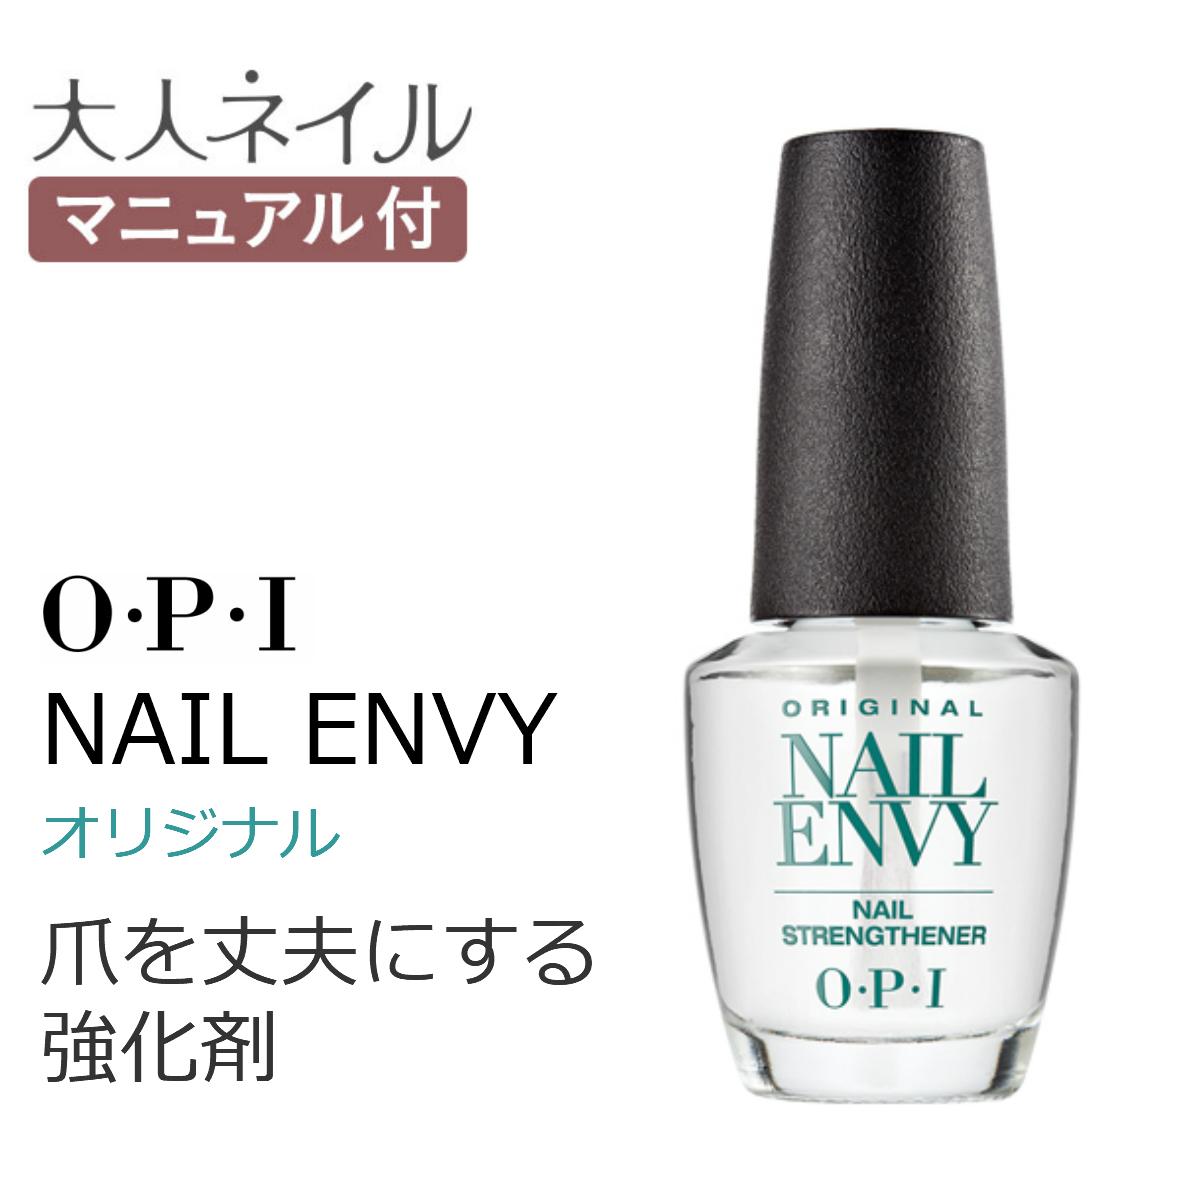 OPI オーピーアイ ネイルエンビー オリジナル 爪強化剤 爪割れ 薄い爪 二枚爪 ベースコート 15ml